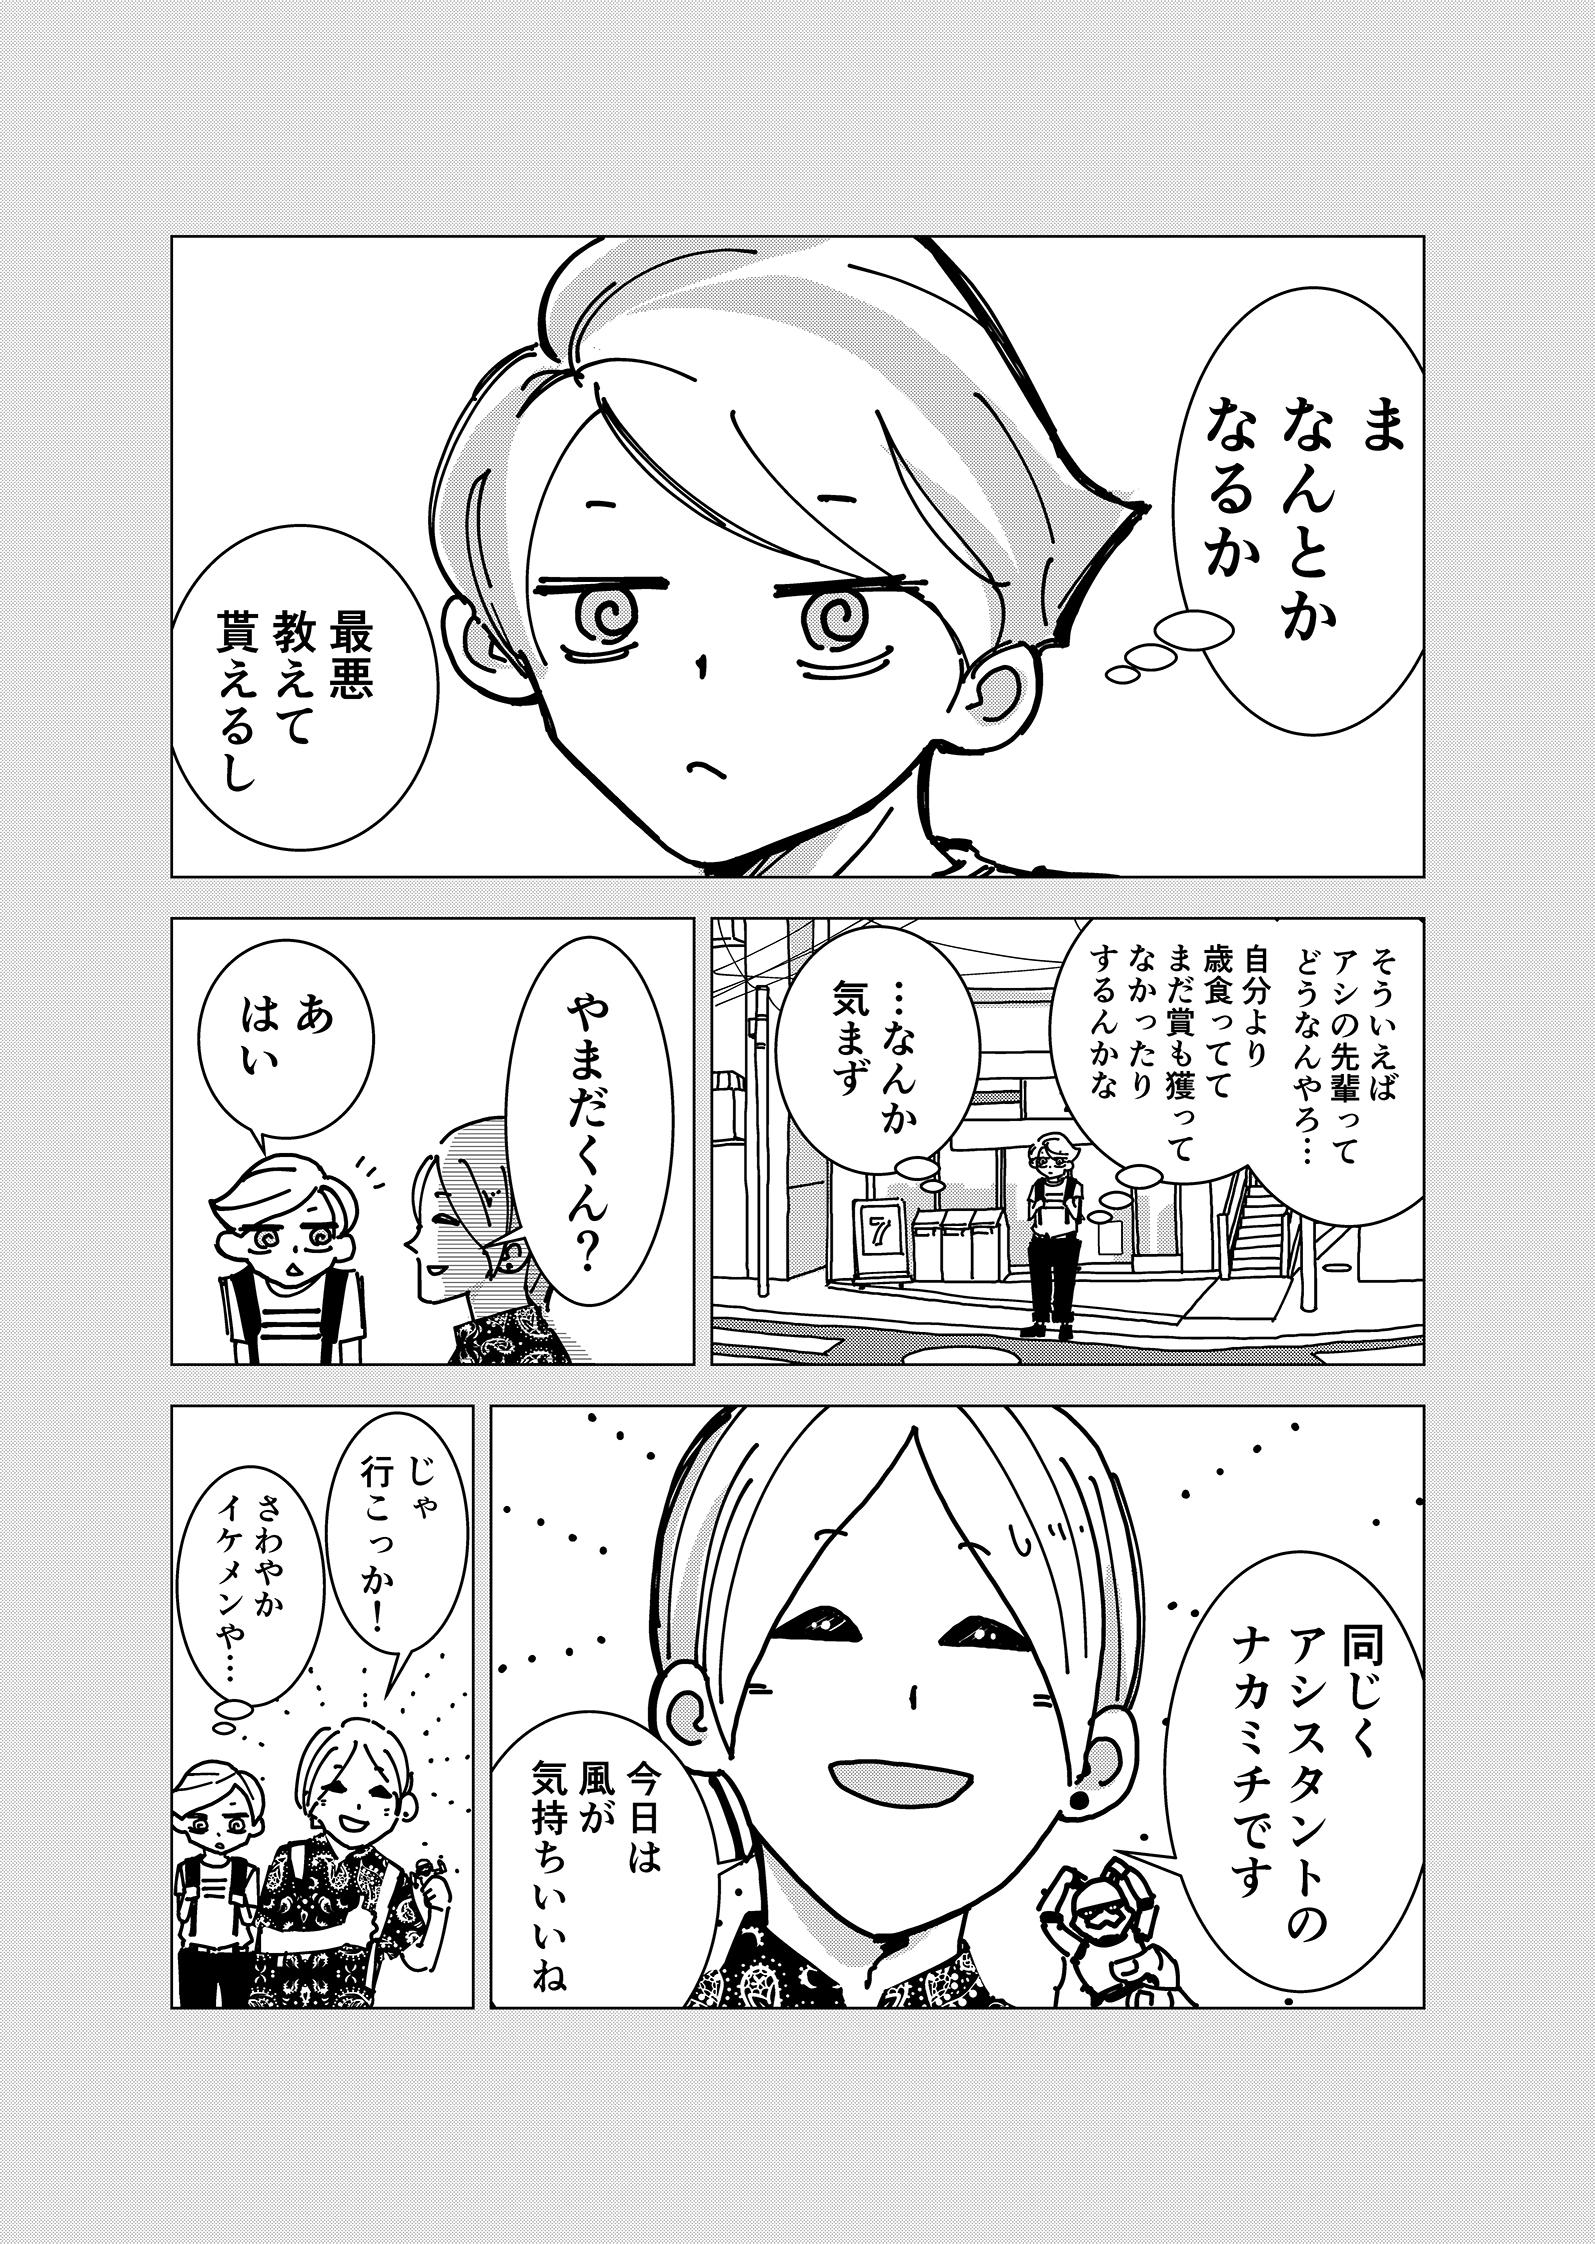 shareman01_002